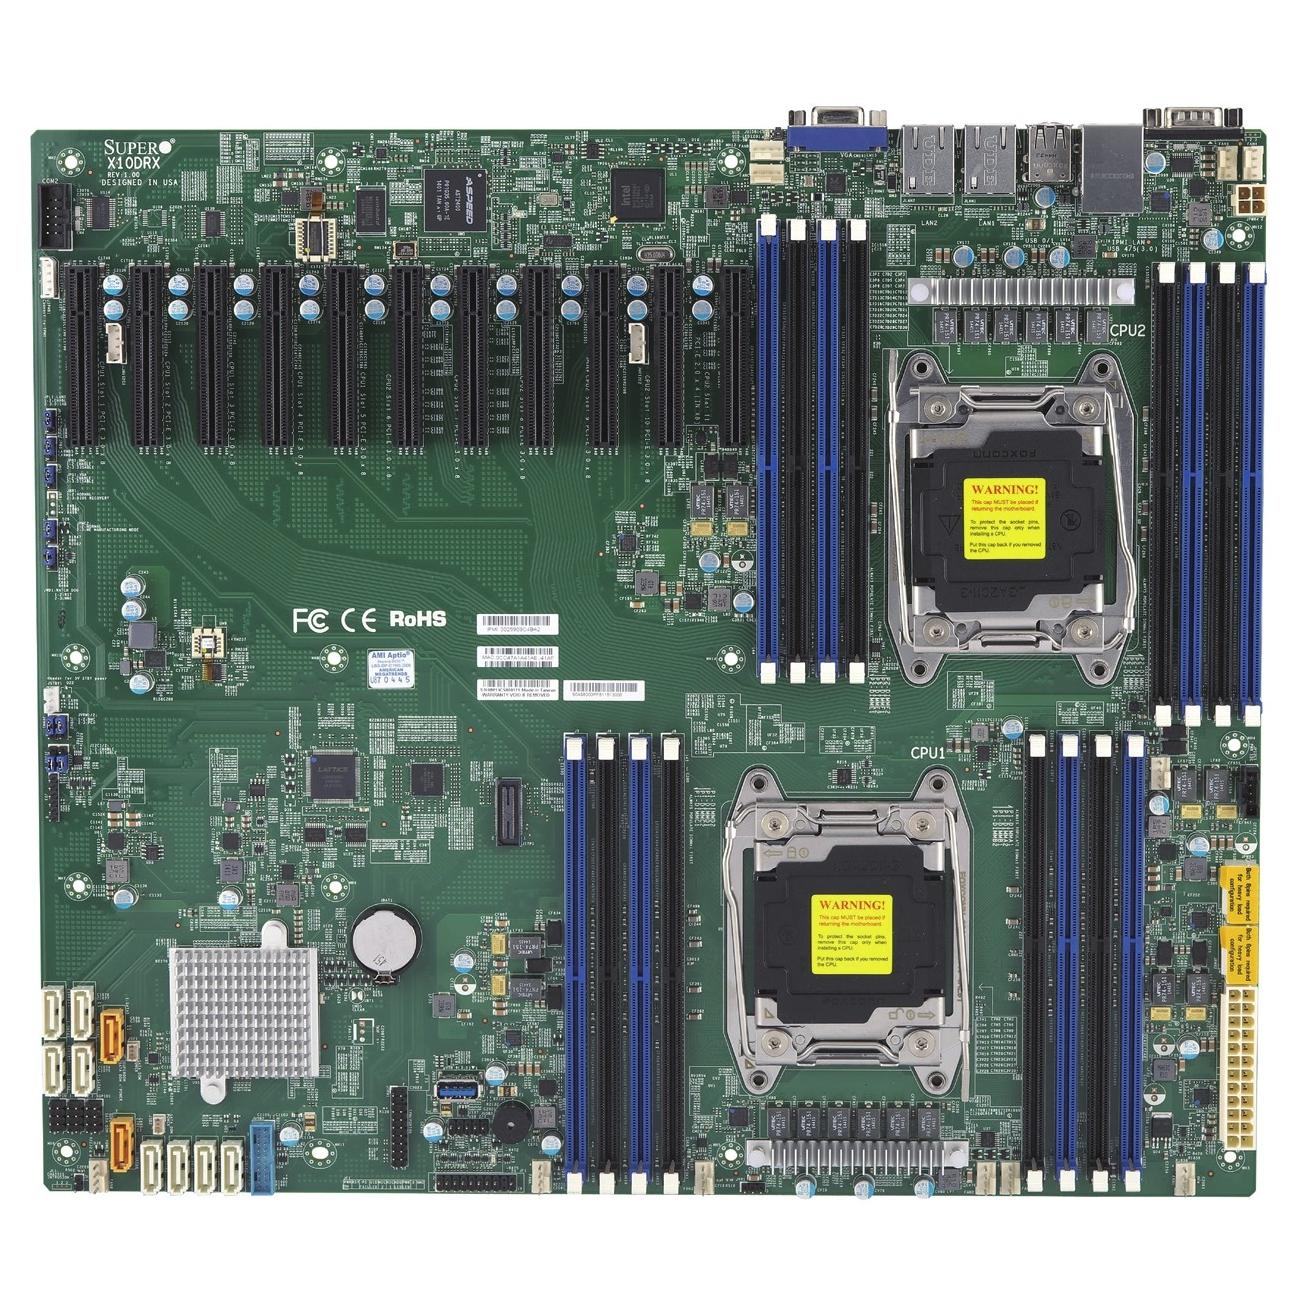 Supermicro 188741 Motherboard Mbd-x10drx-b E5-2600v4/v3 S2011 2xr3 Pci Express Proprietary Brown Box